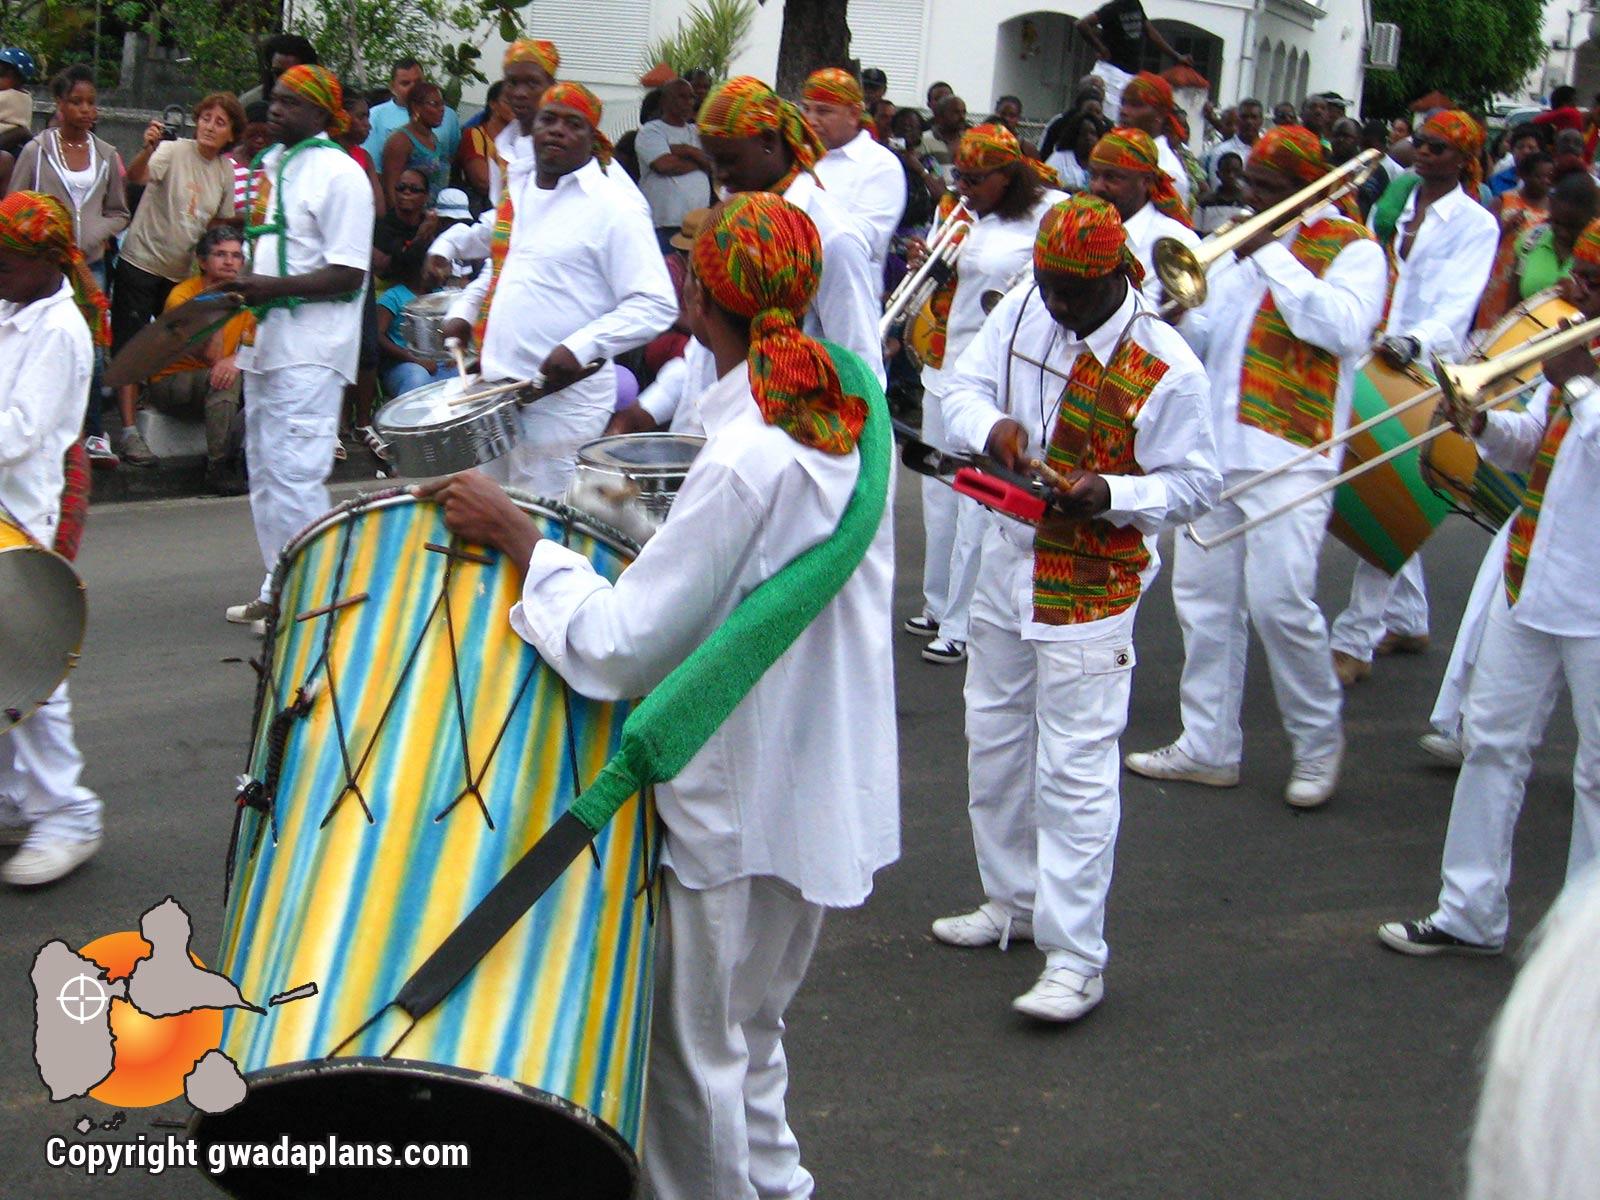 Carnaval Guadeloupe - Peau